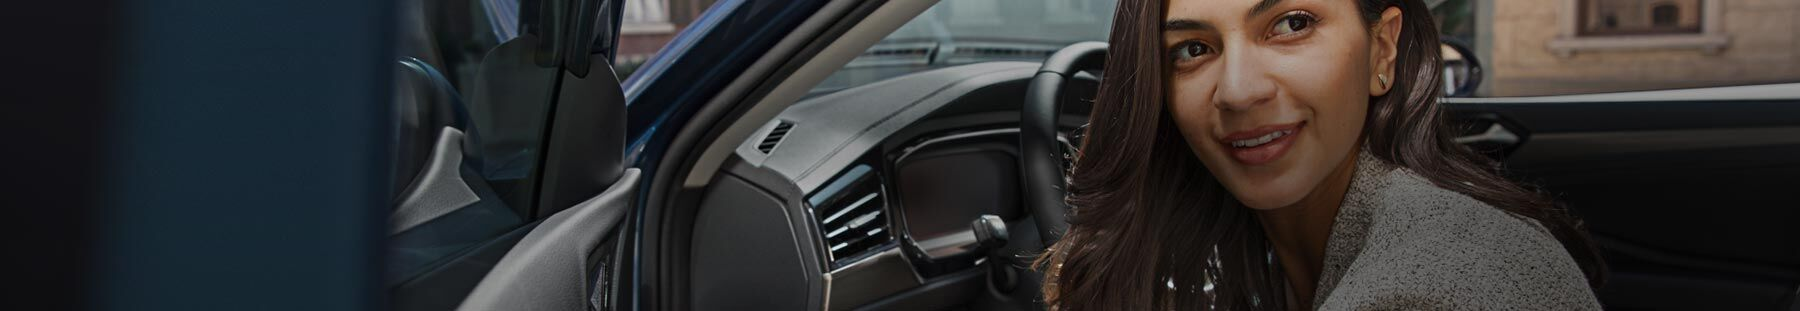 All New Volkswagen Jetta in Monroeville, NJ